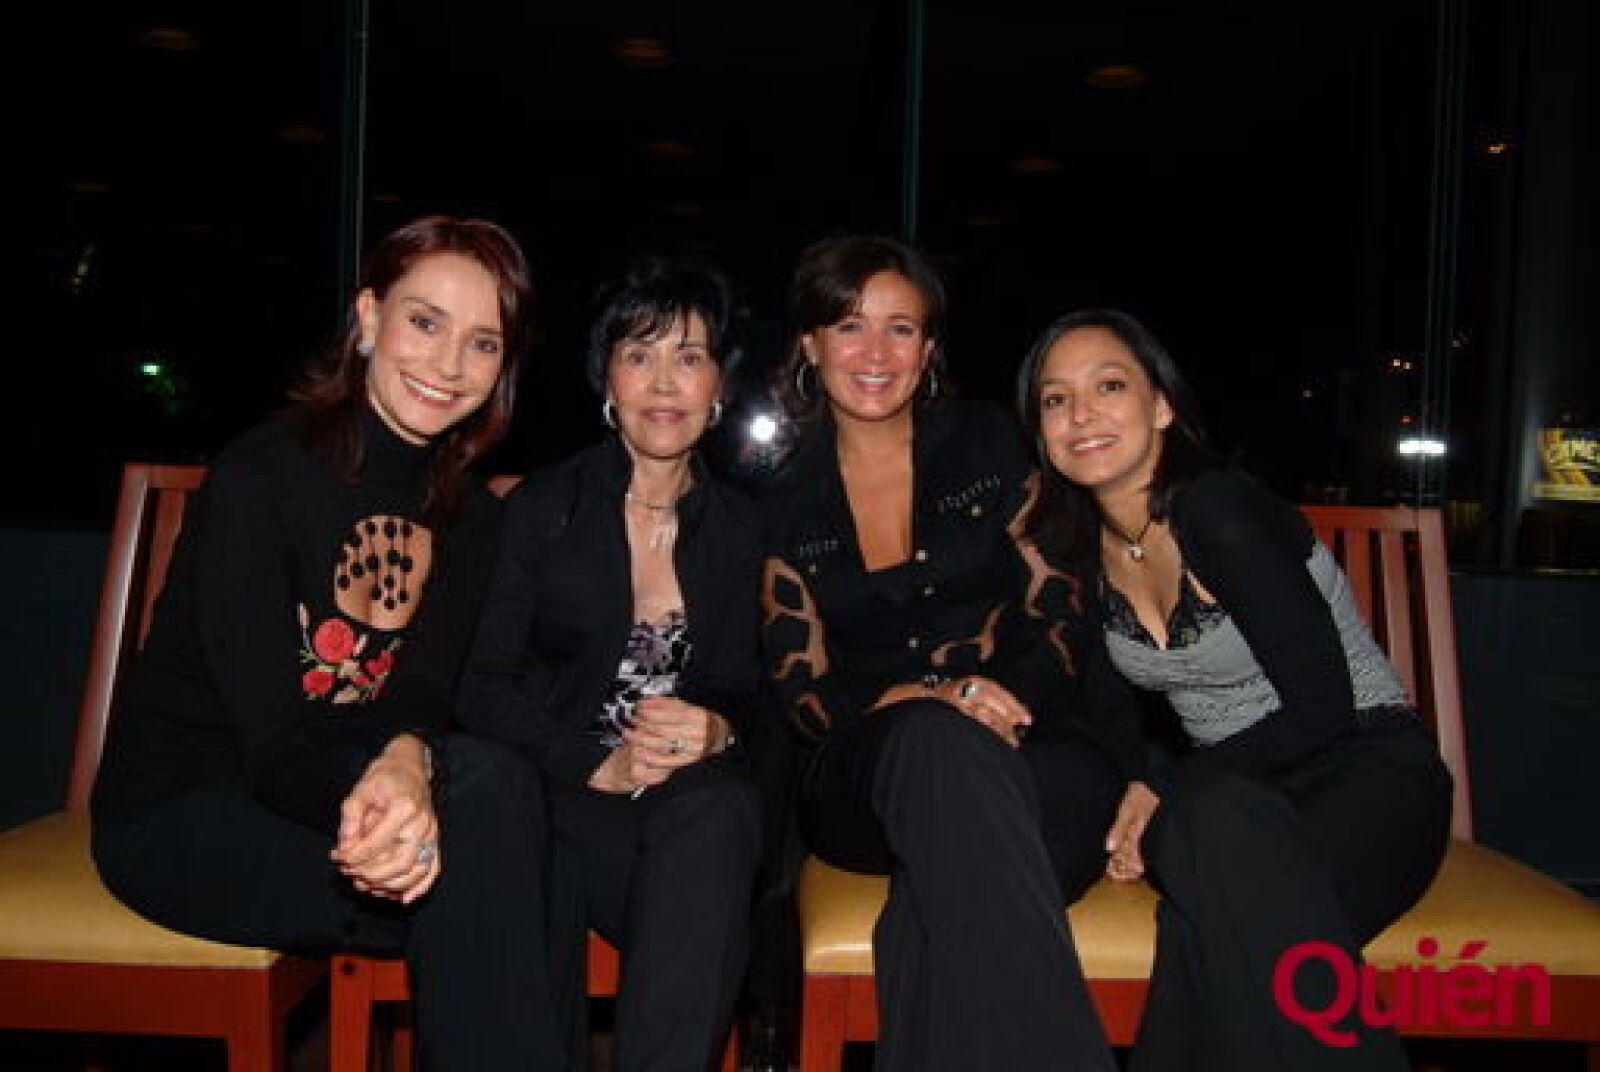 Claudia Peñalosa, Cristina Ramírez, Liliana de Ramírez, Dolores de Ramírez